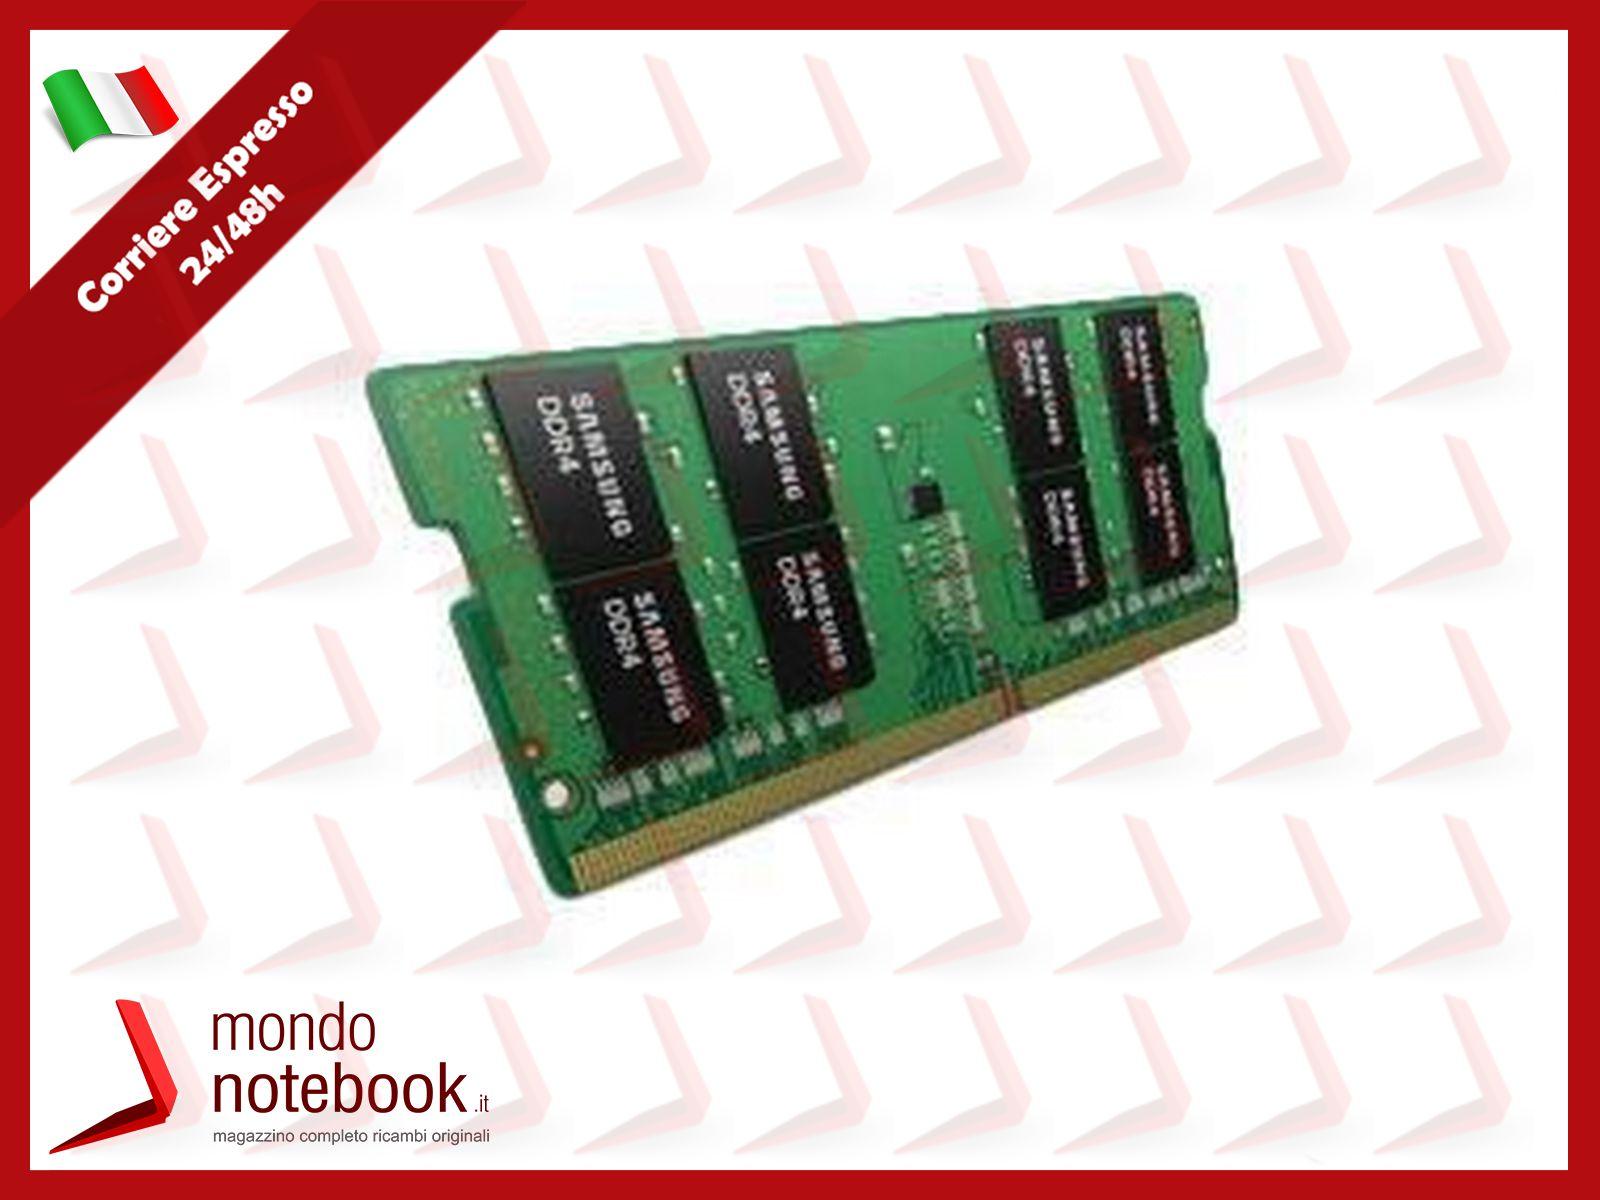 https://www.mondonotebook.it/10330/connettore-di-alimentazione-dc-power-jack-hp-pj818-envy-17-r-10-pin.jpg